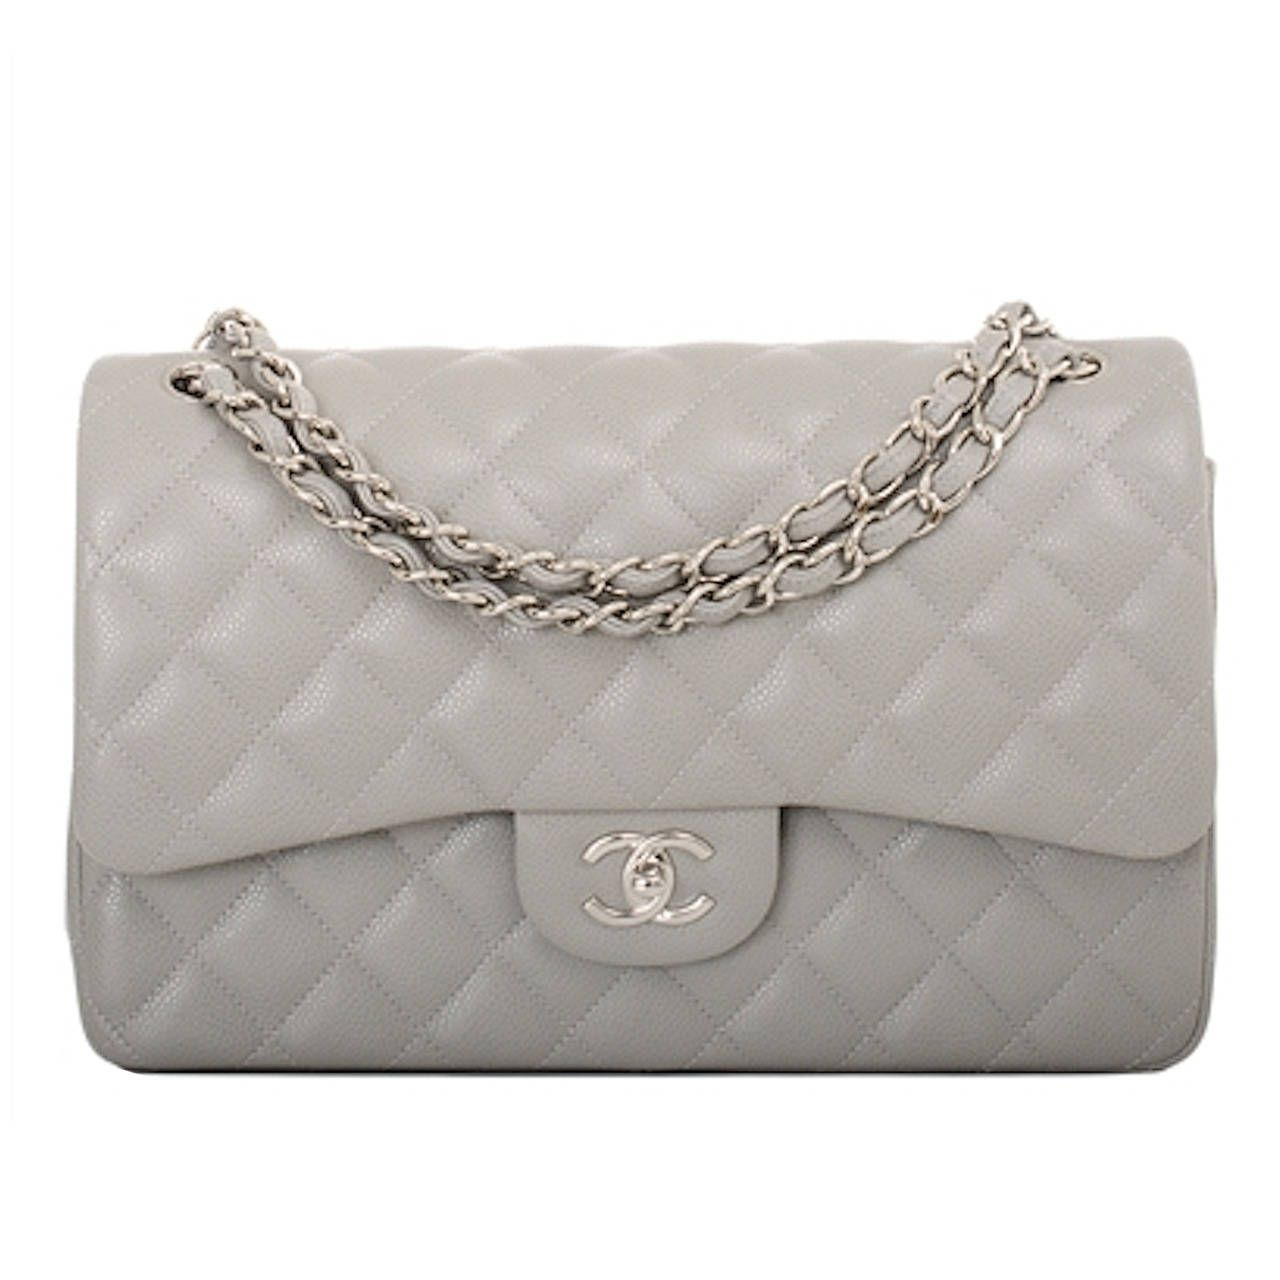 Chanel handbag superb vintage chanel bag vintage leather - Chanel Light Grey Quilted Caviar Jumbo Classic Double Flap Bag